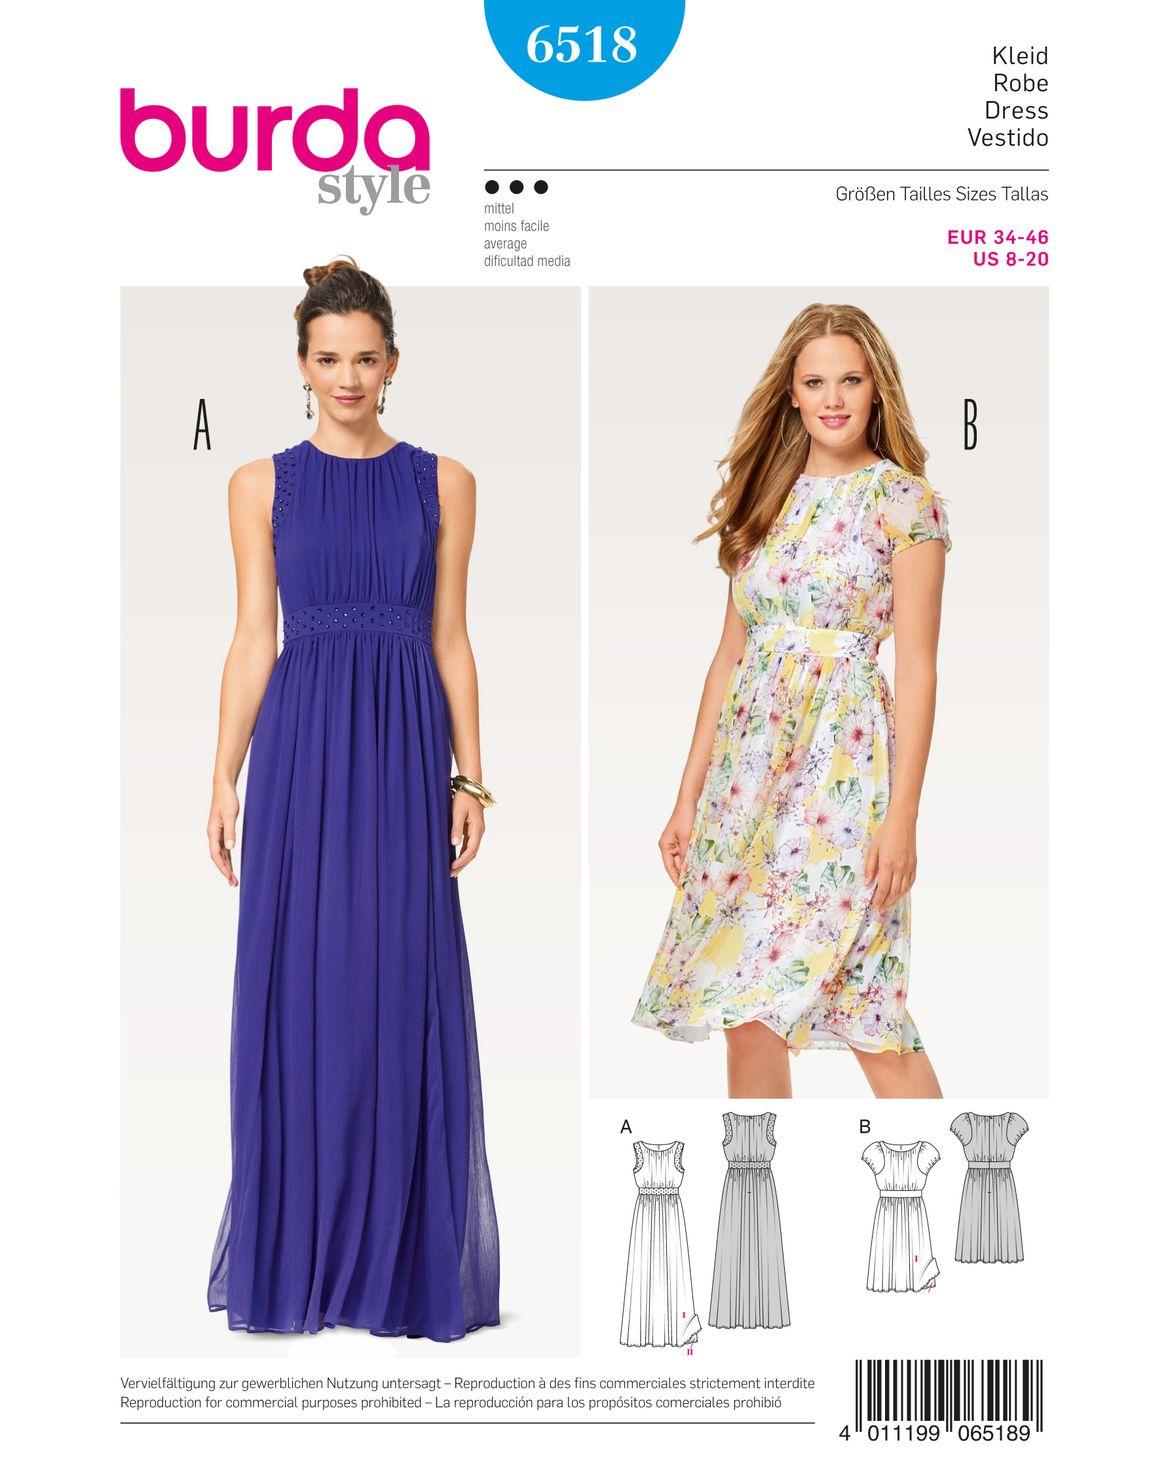 burda style, Katalog Schnitt, Kleid F/S 2017 #6518A, Elegantes ...